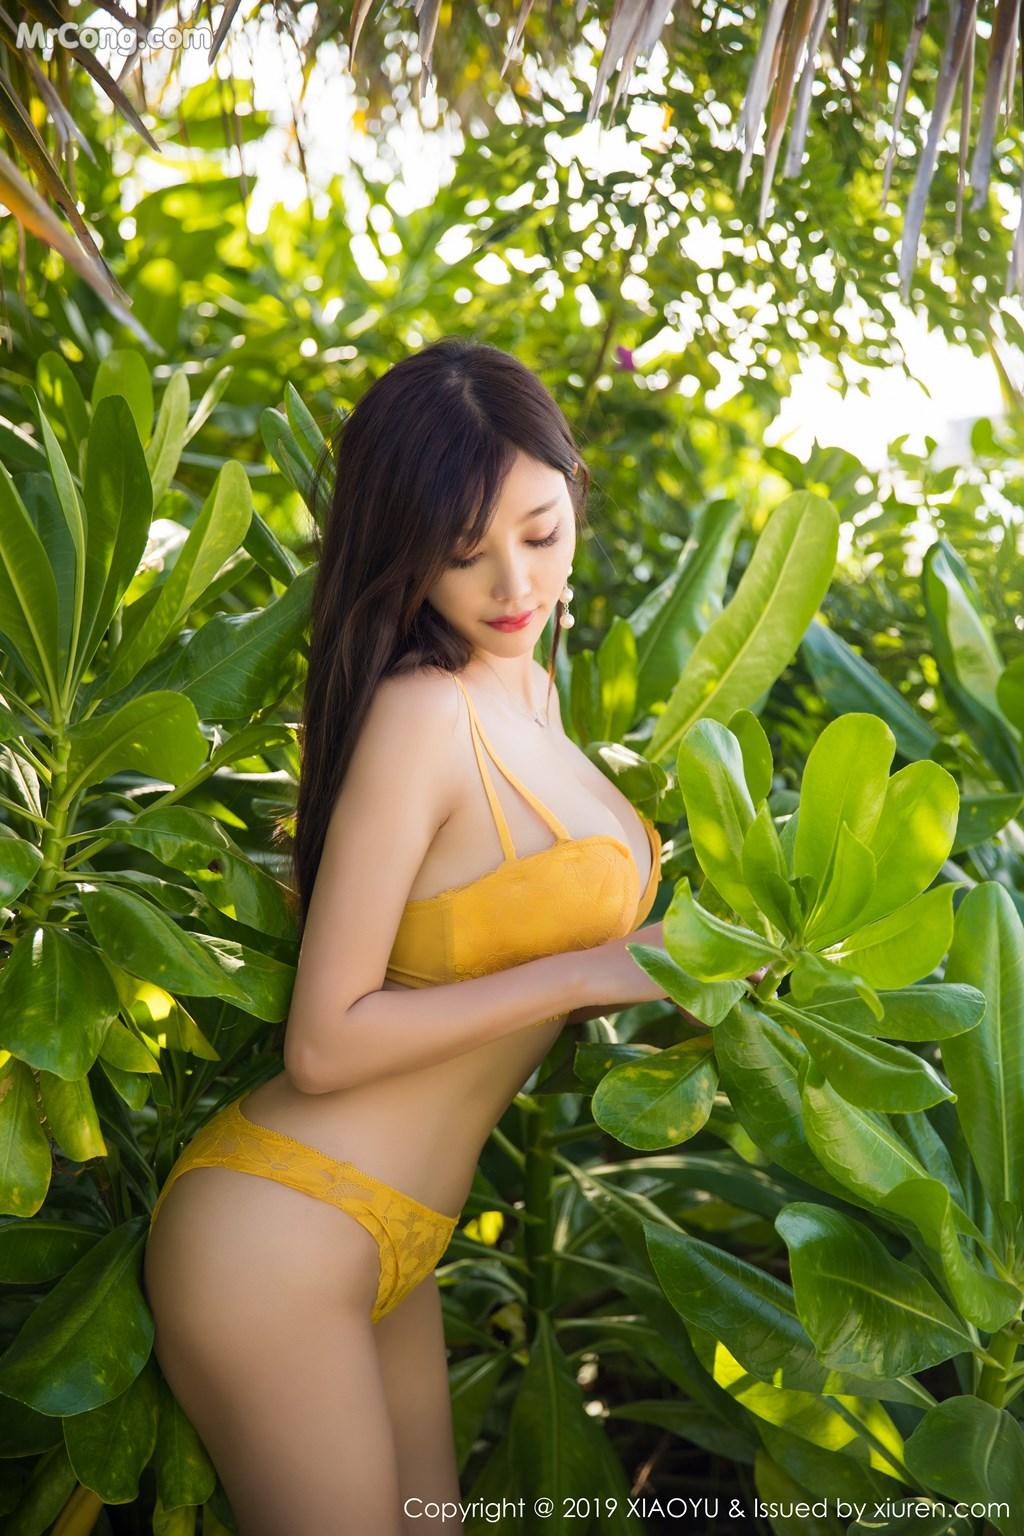 XiaoYu Vol.124: Yang Chen Chen (杨晨晨sugar) (60P)